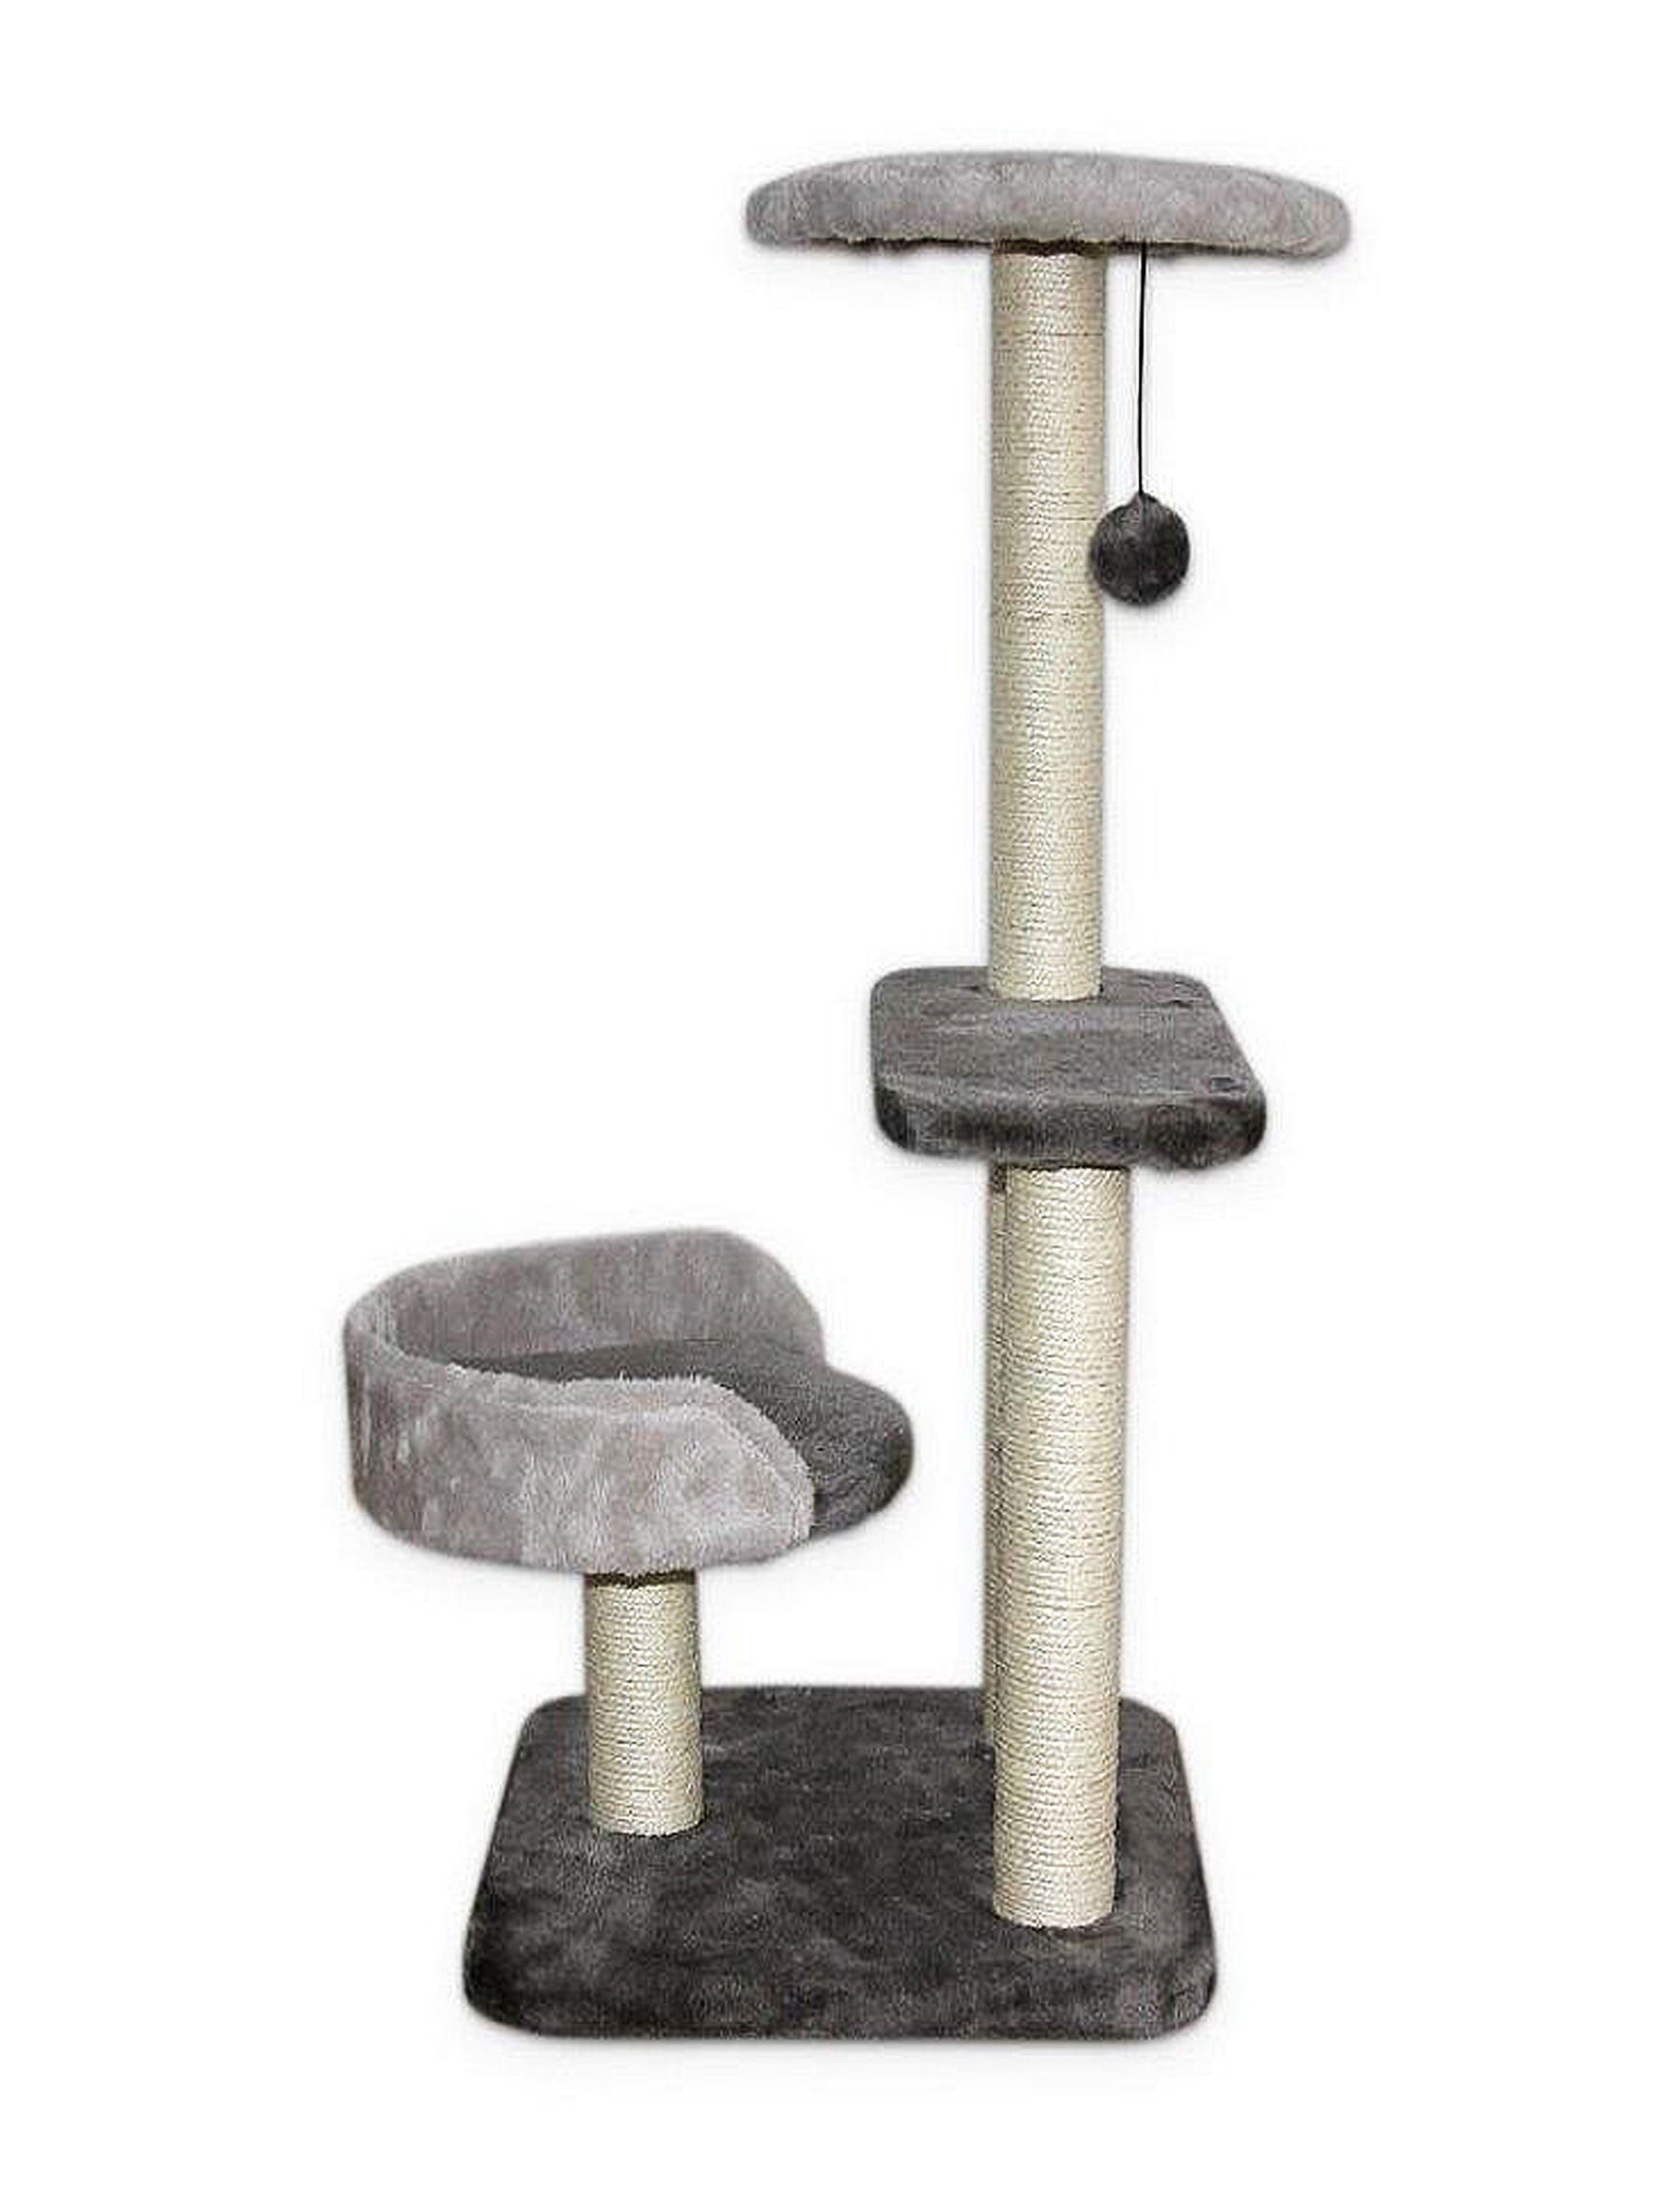 ASPCA Grey Pet Beds & Houses